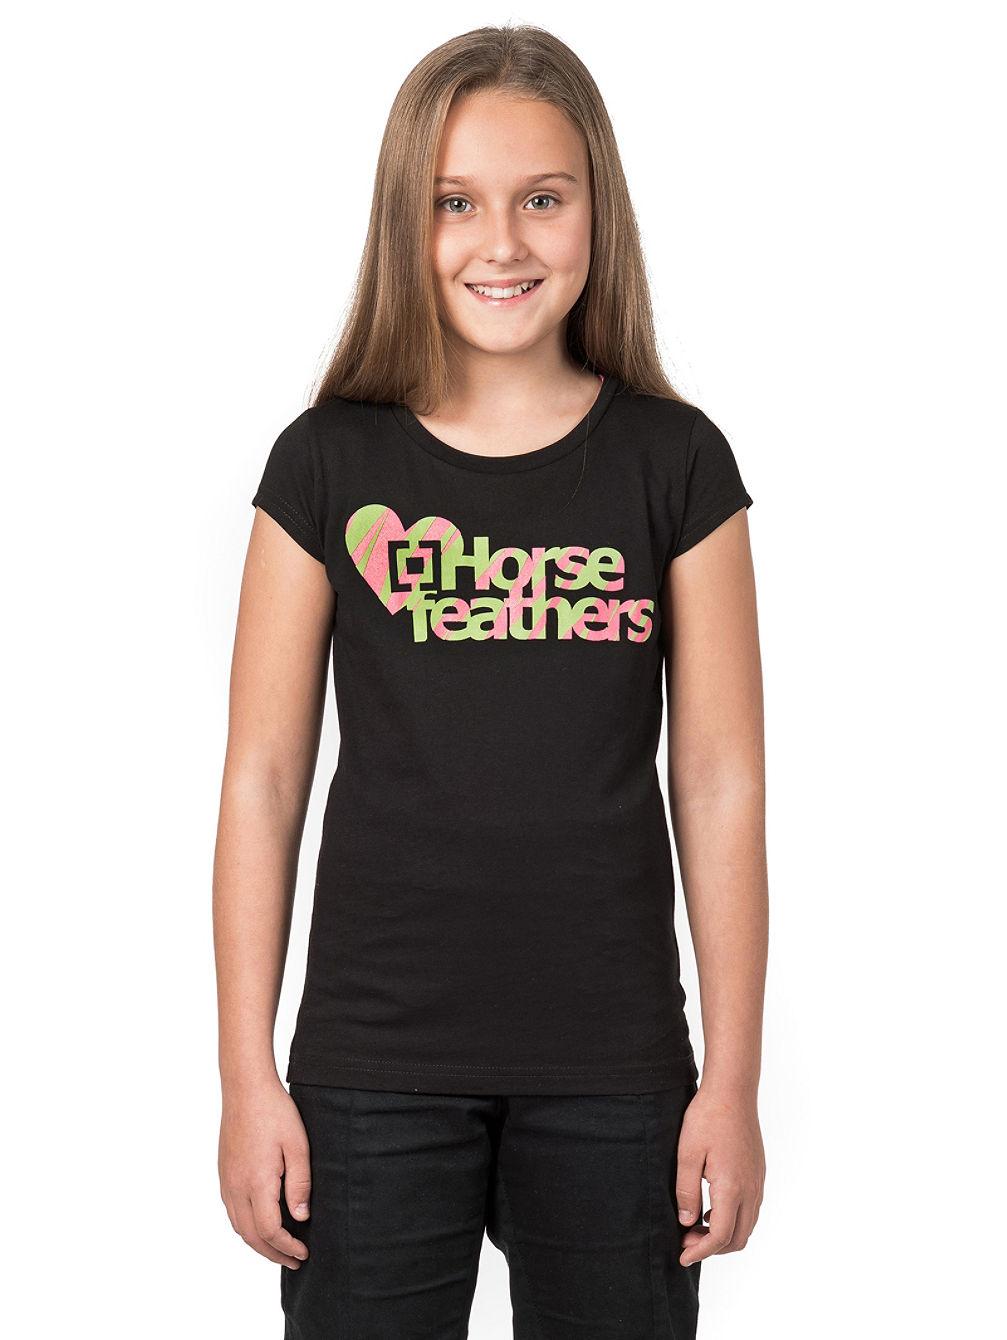 d38e8f37e Buy Horsefeathers Harper T-Shirt Girls online at blue-tomato.com